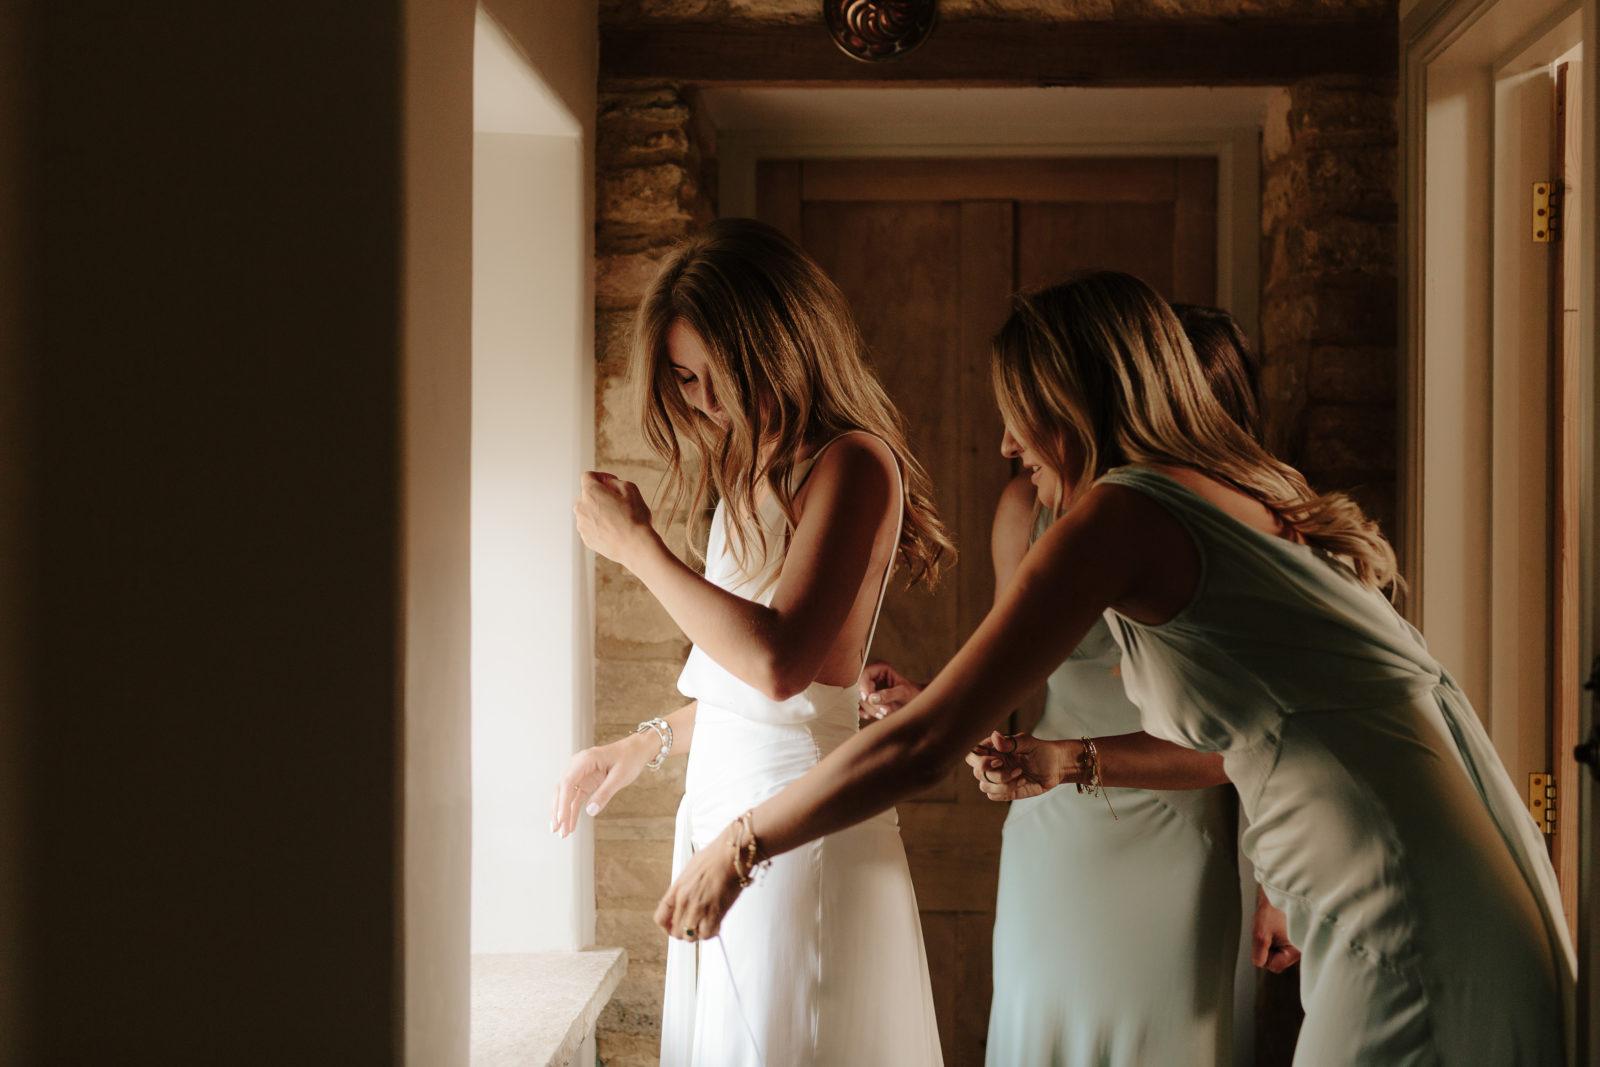 Wedding Dress - Delphine Manivet Wedding Dress